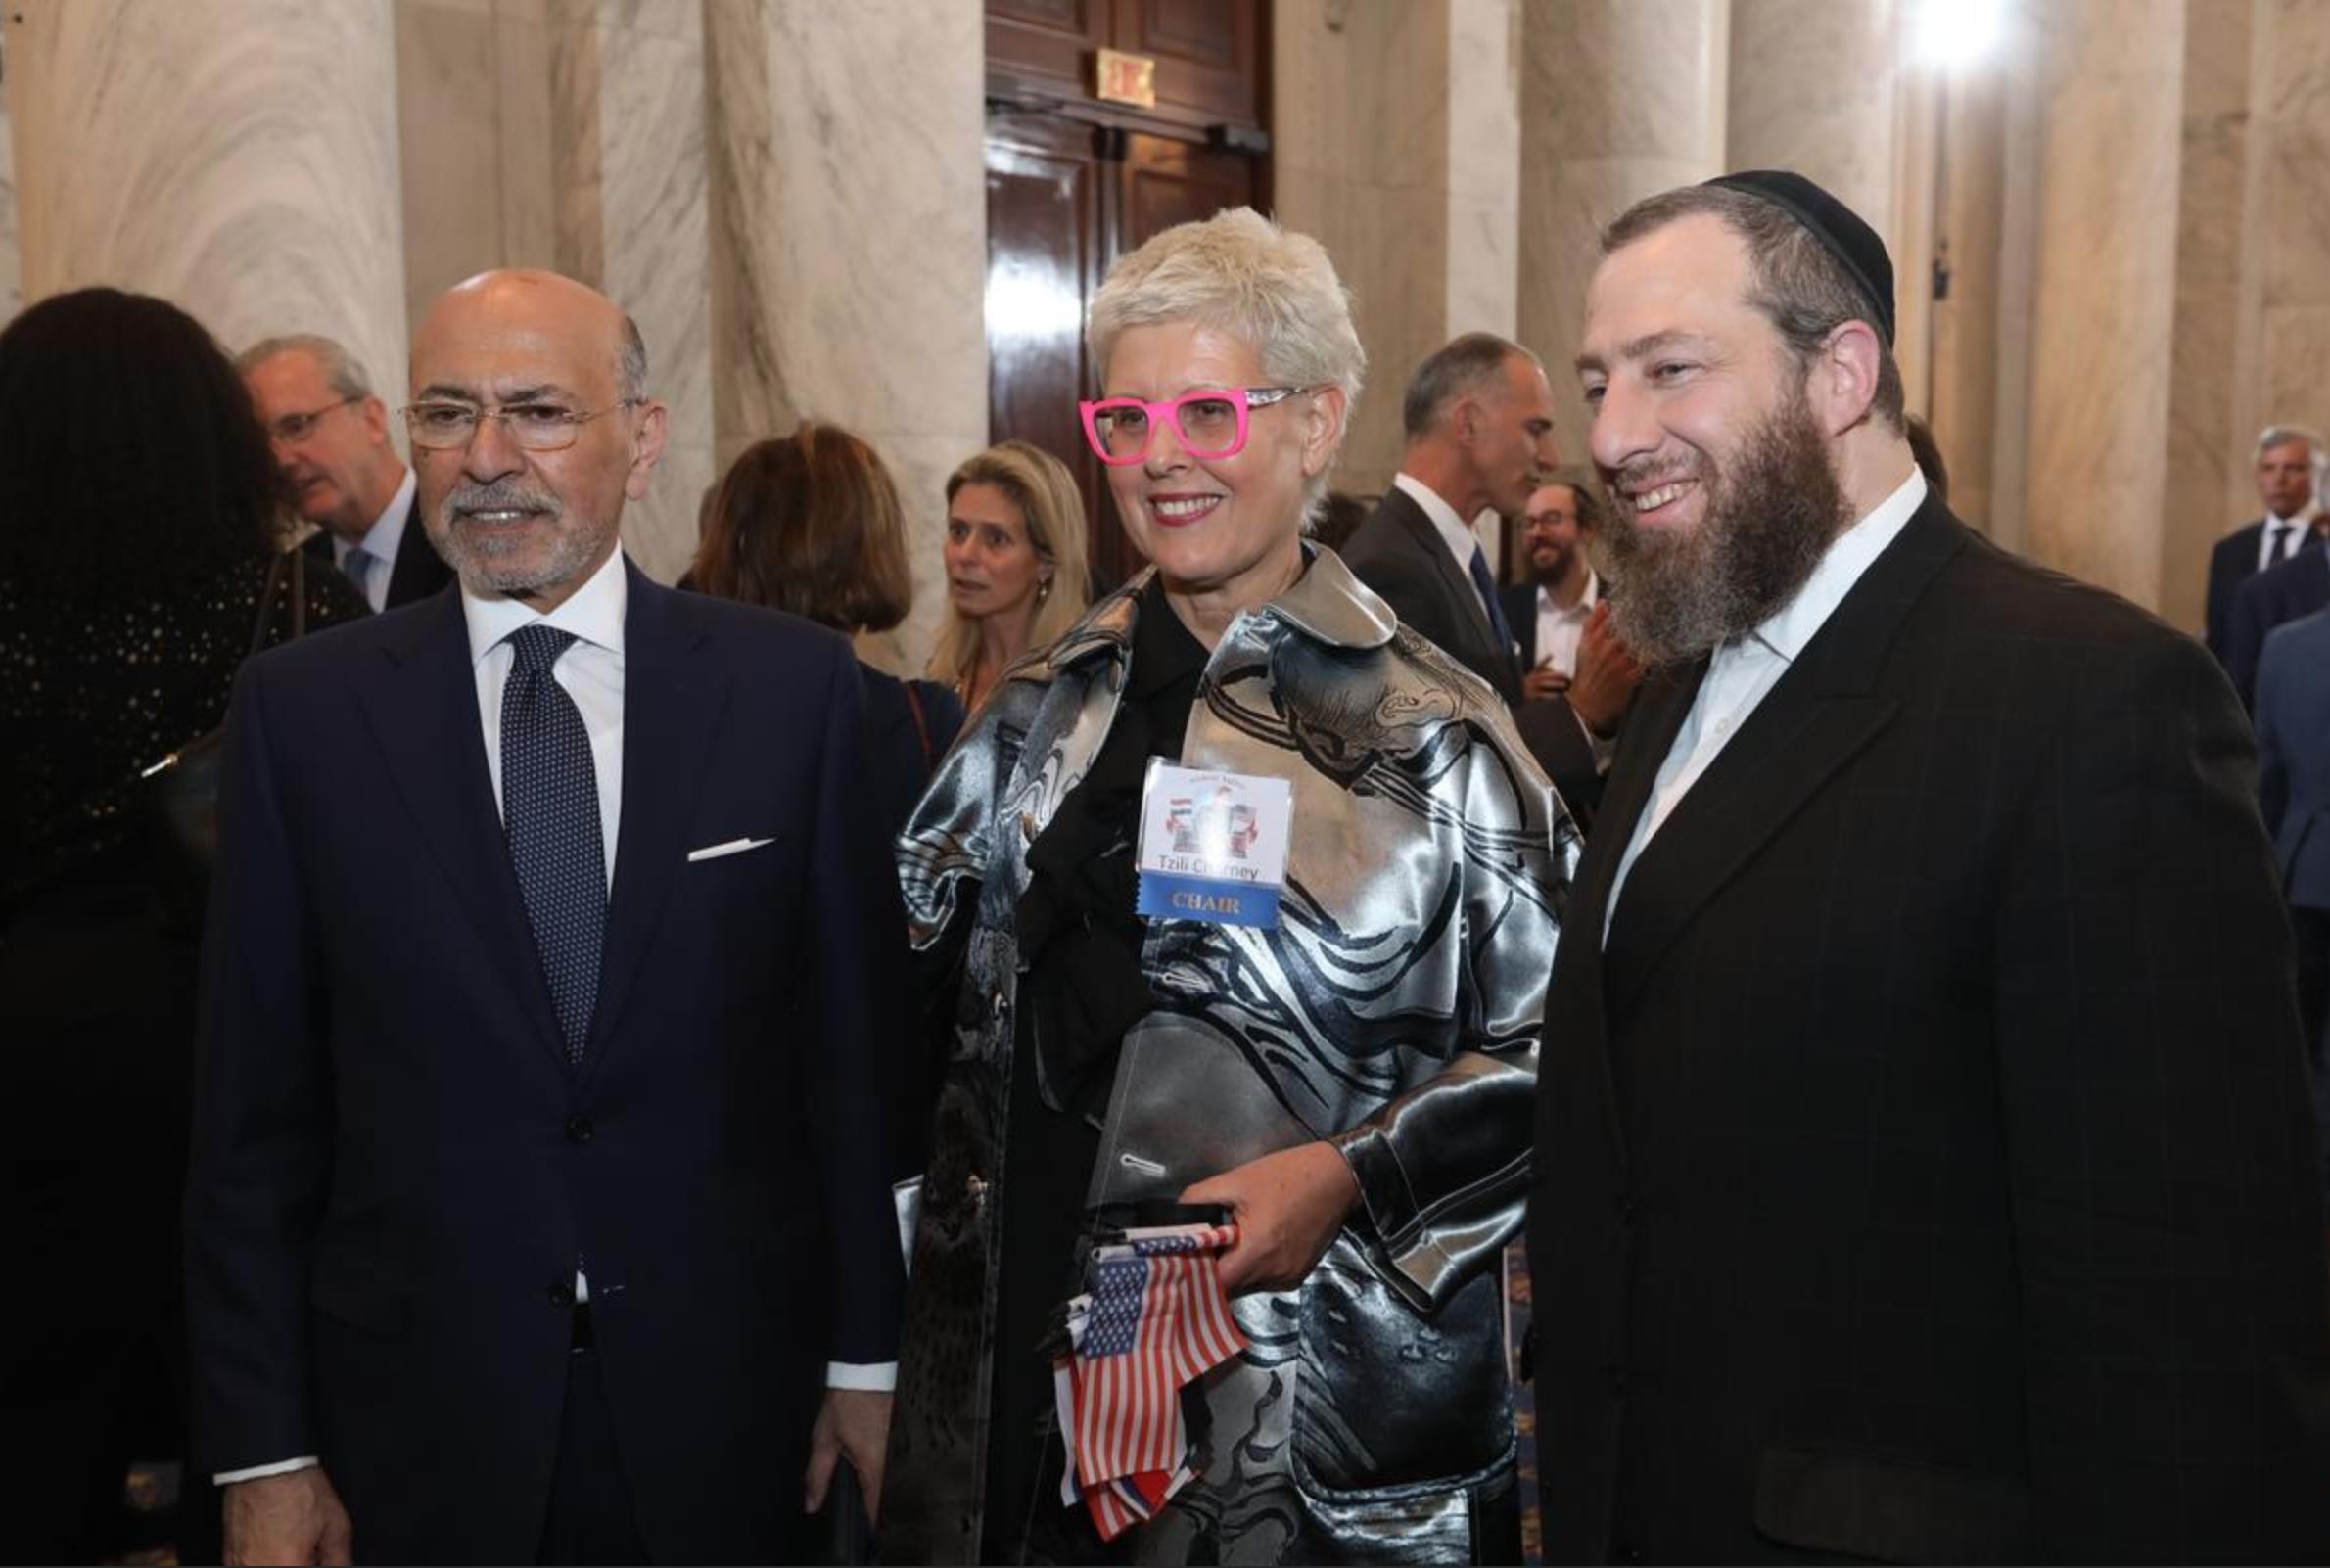 Artoc Shafik Gabr, Tzili Charney and Ezra Friedlander